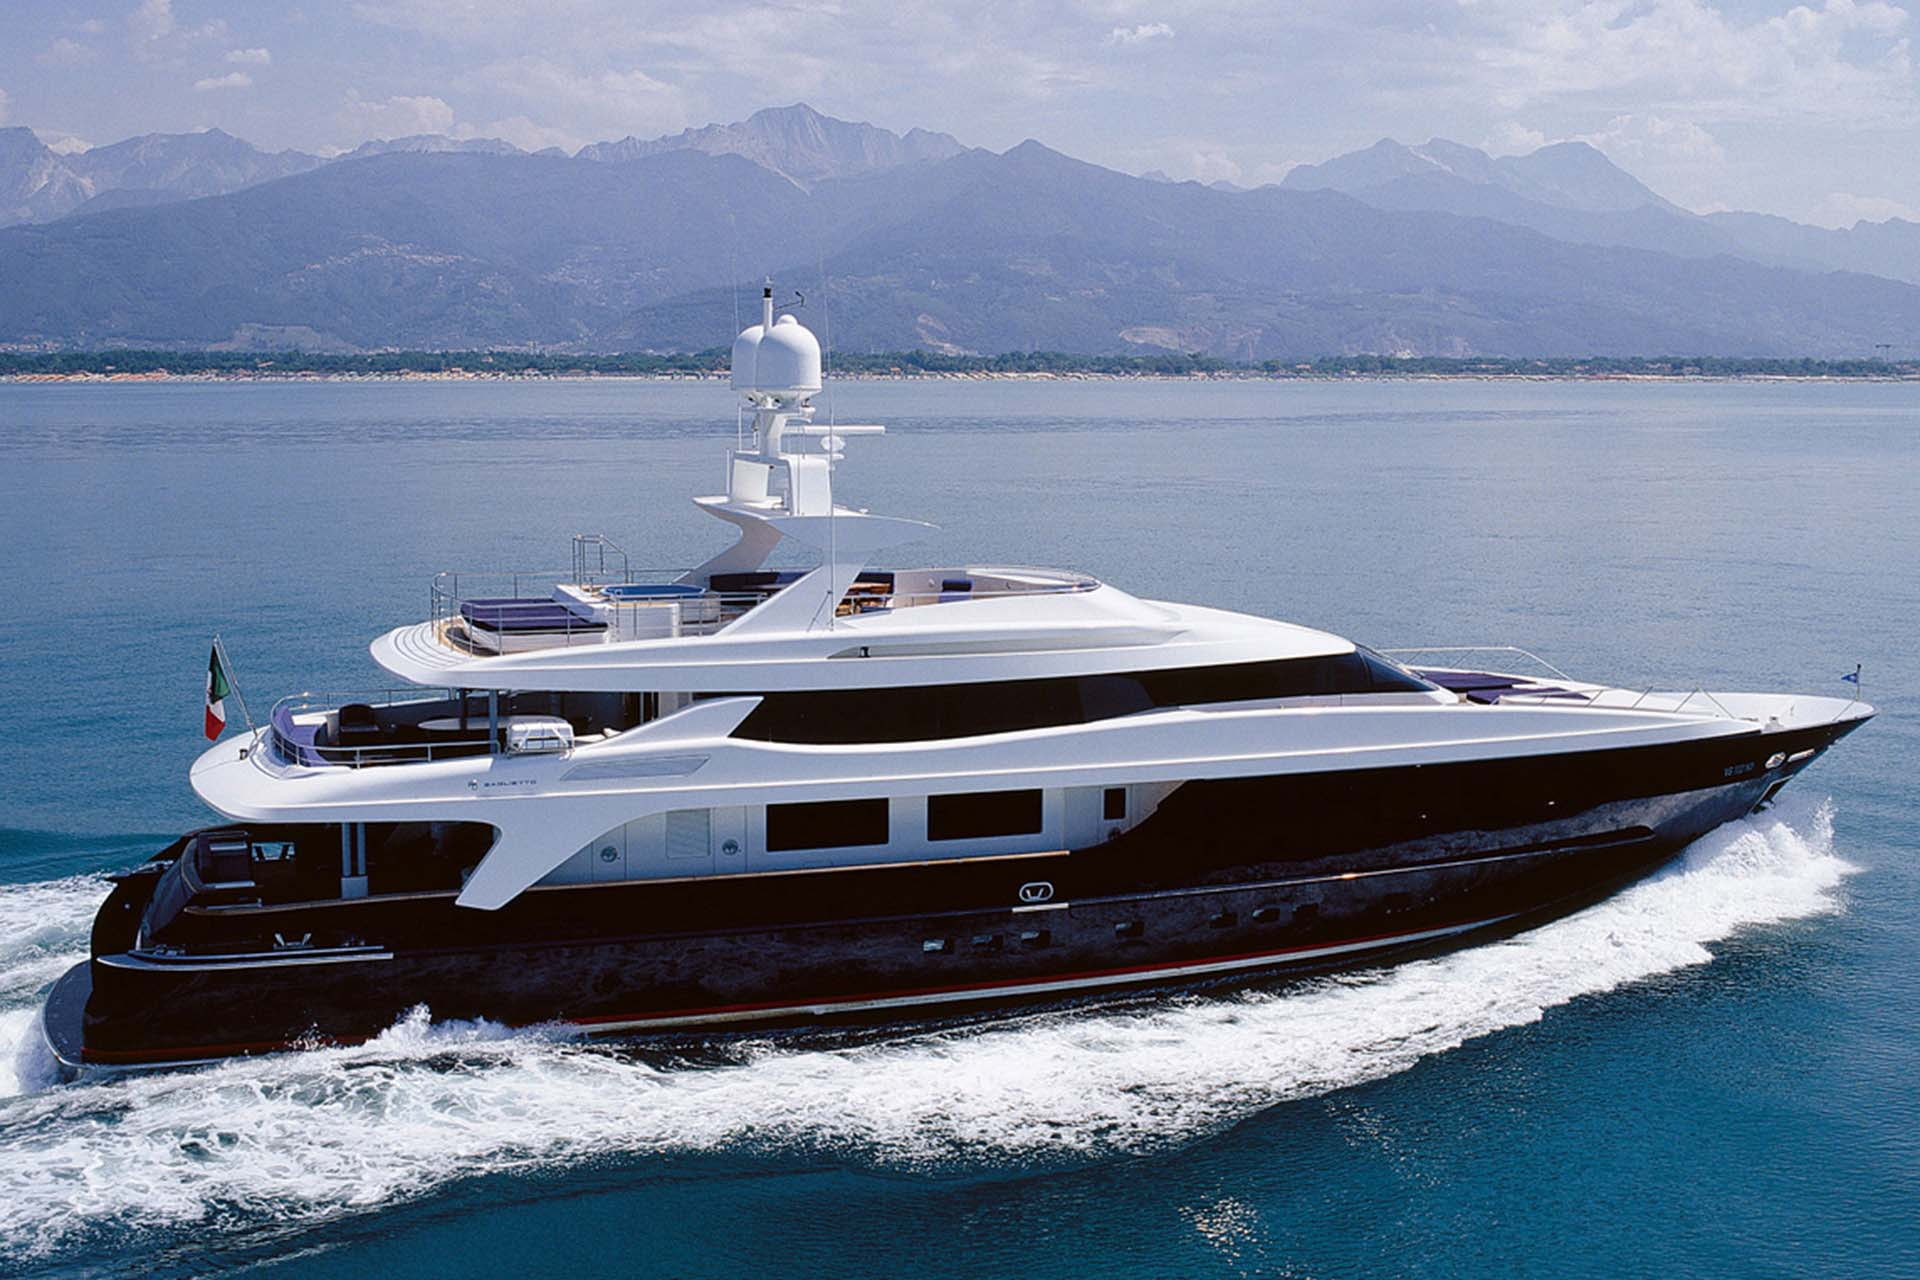 baglietto - BLUE SCORPION - Paskowsky Yacht Design